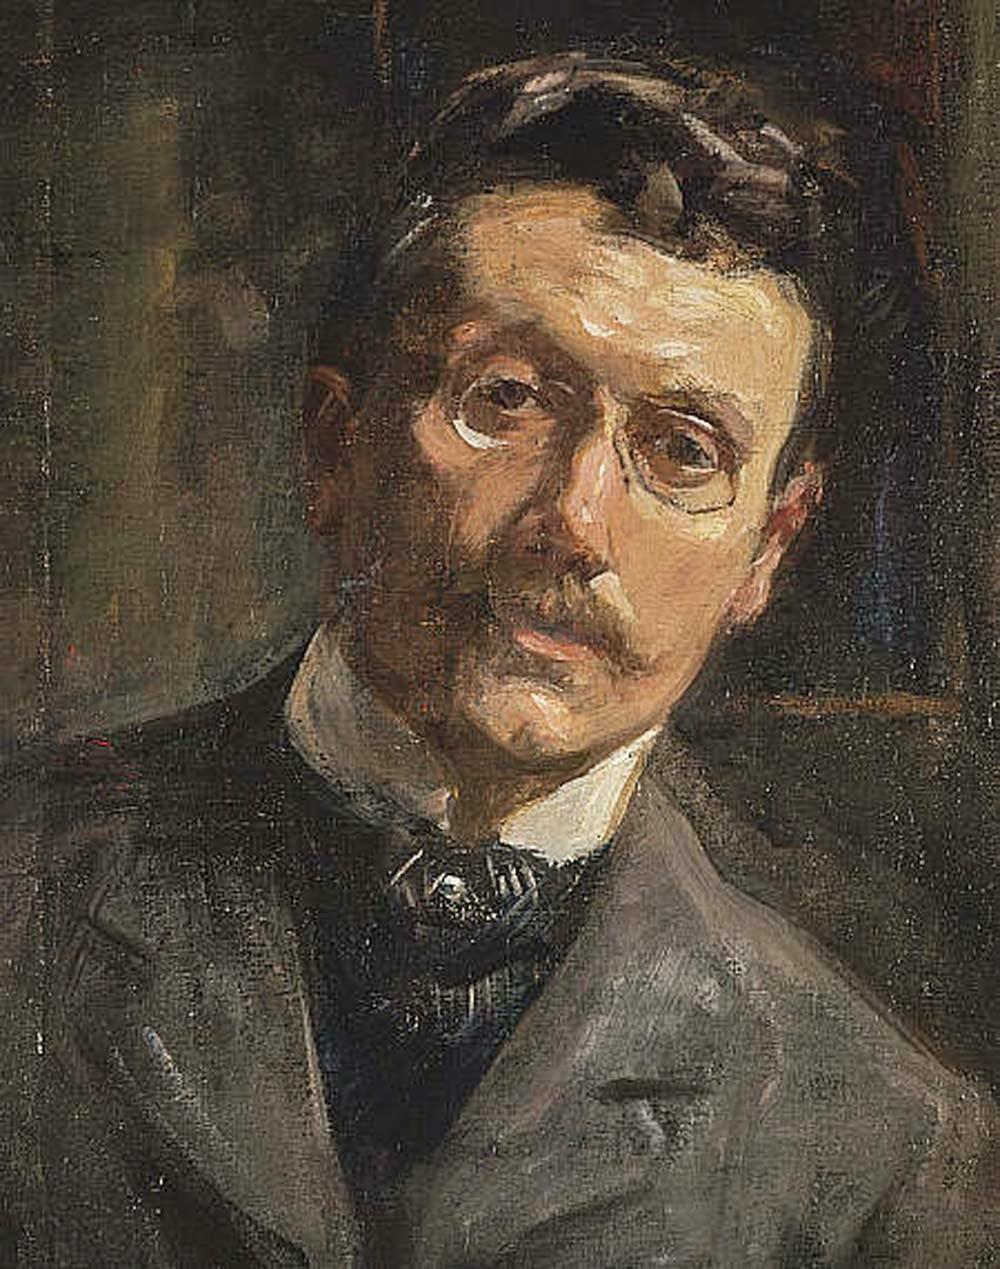 Alexander Ignatius Roche, Portraits of Painters, Fine arts, Self-Portraits